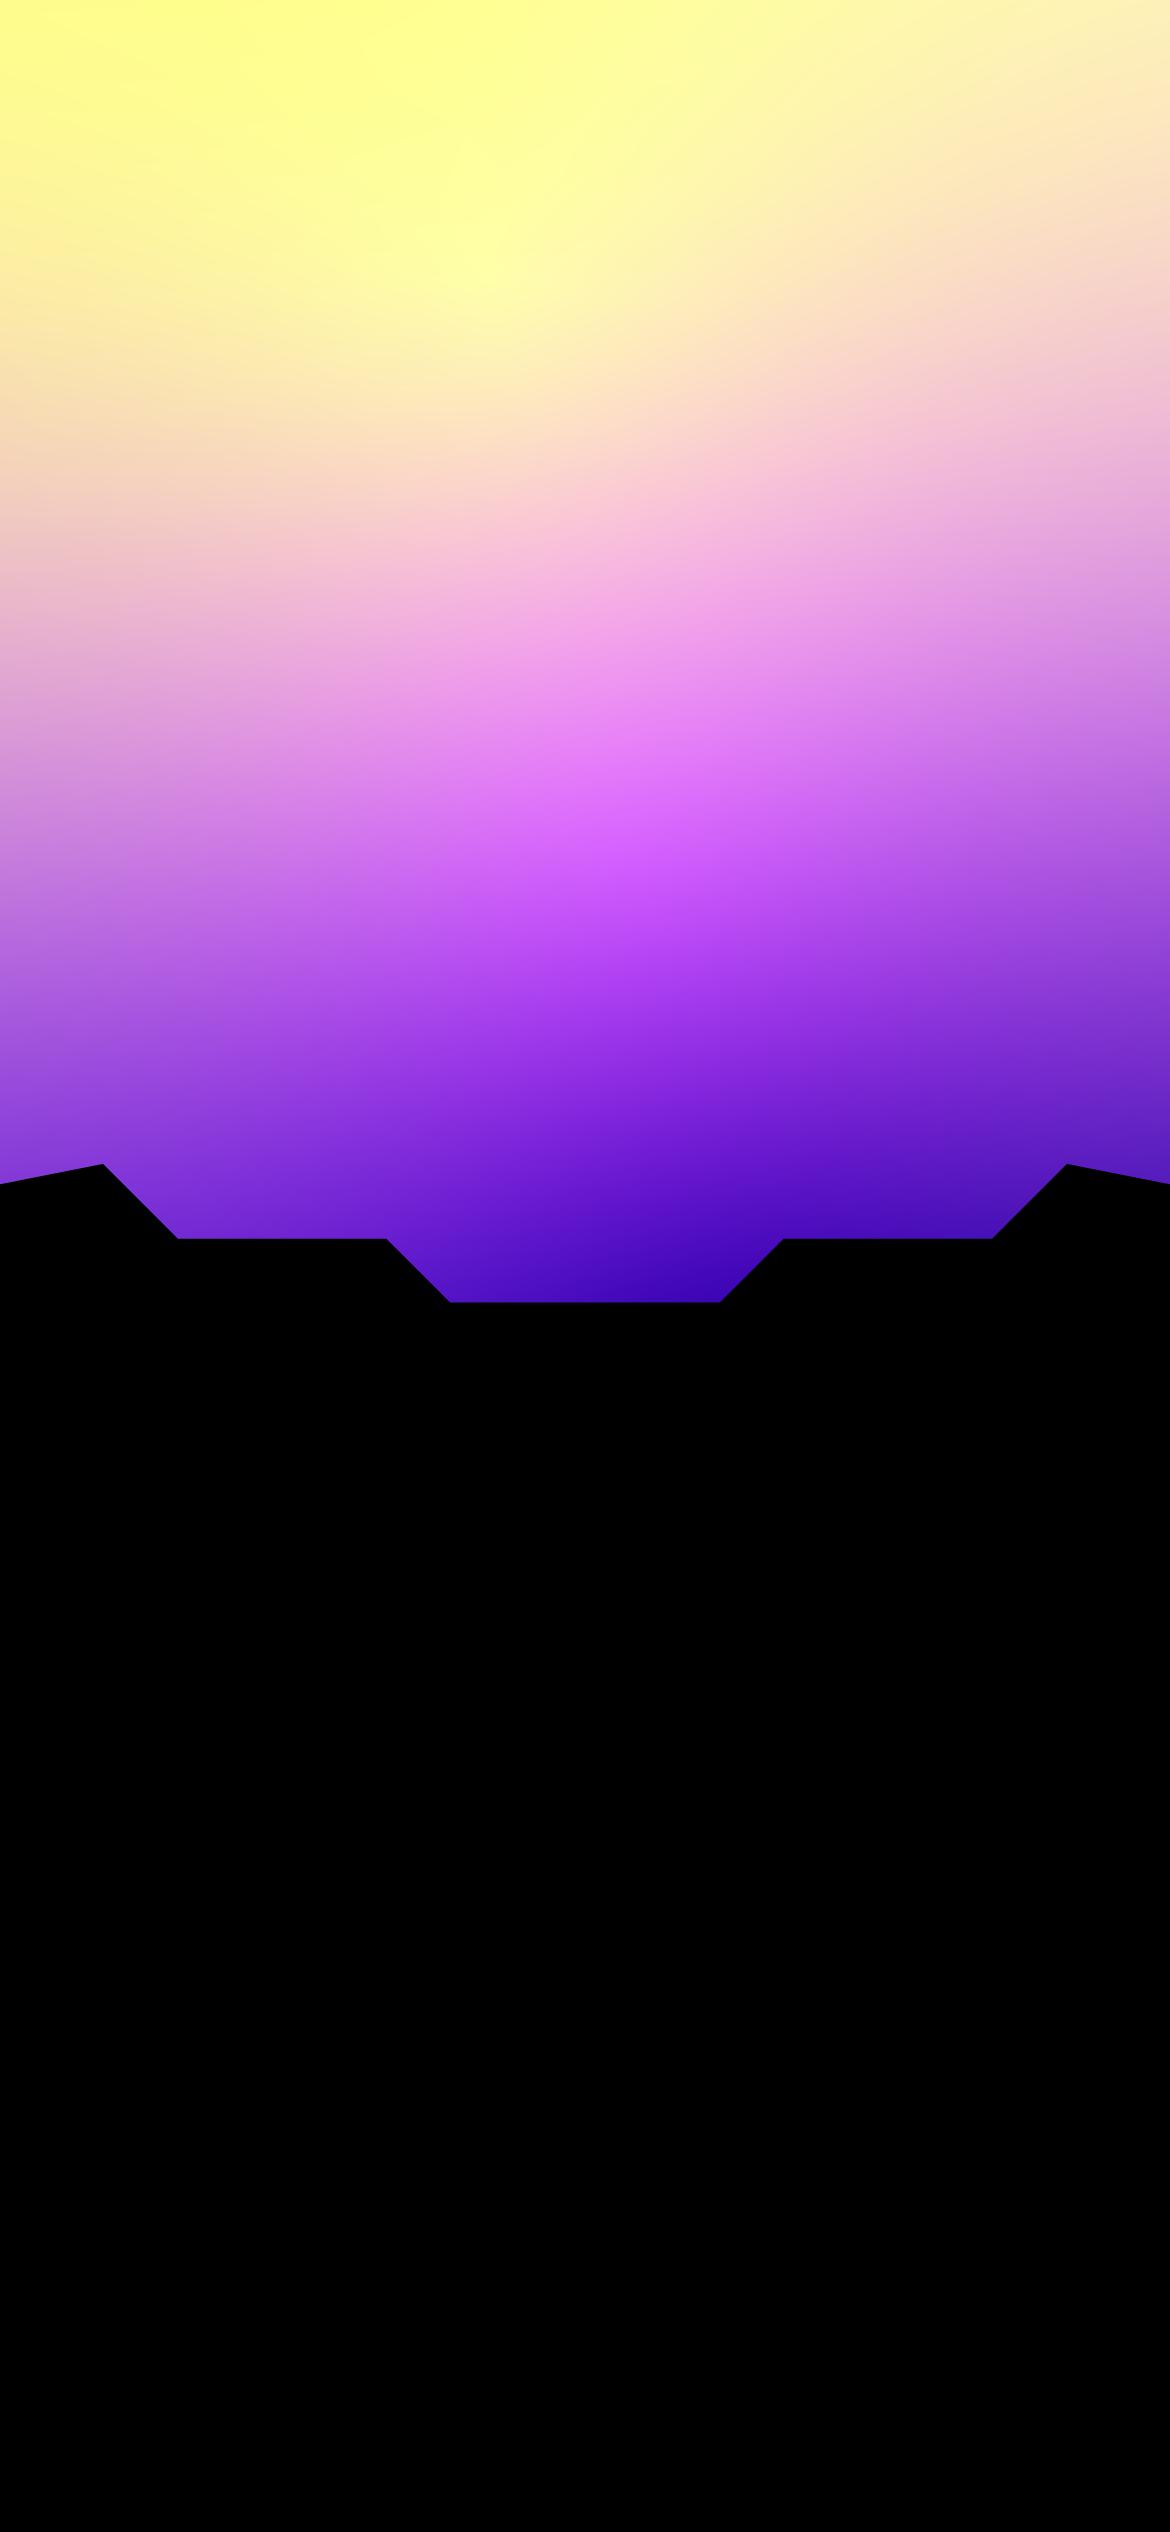 iphone 12 wallpaper oled gradient